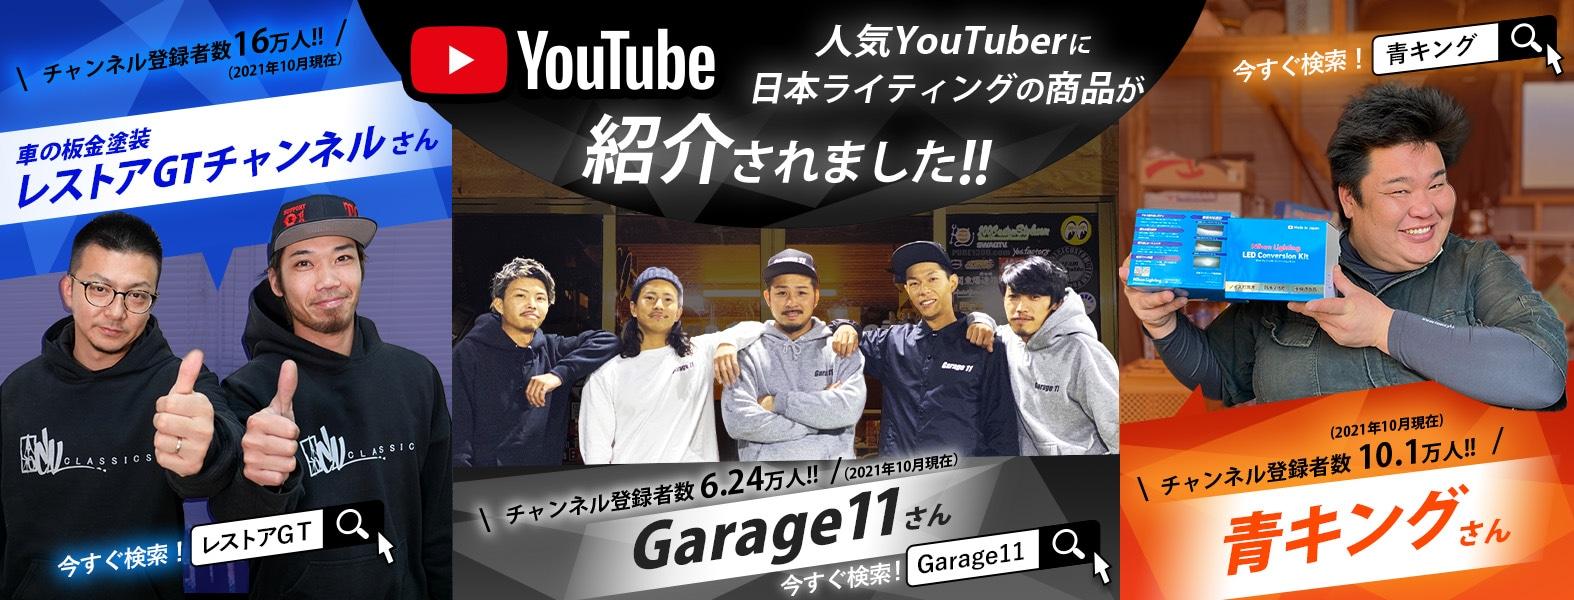 Garage11・青キング・レストアGTに紹介